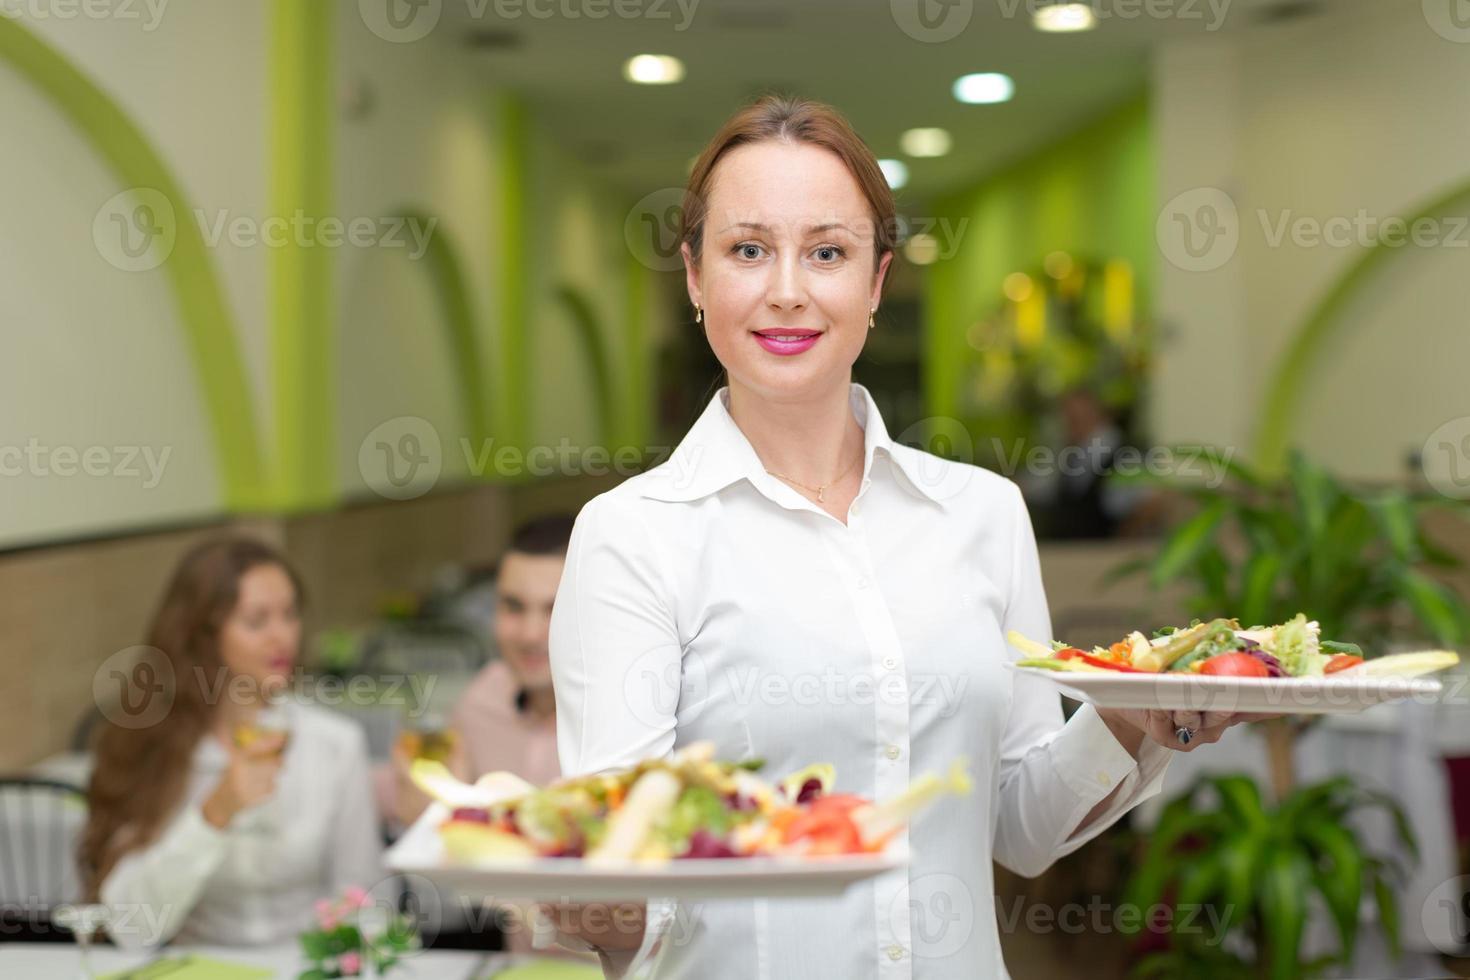 serveur féminin, servir, invités, table photo